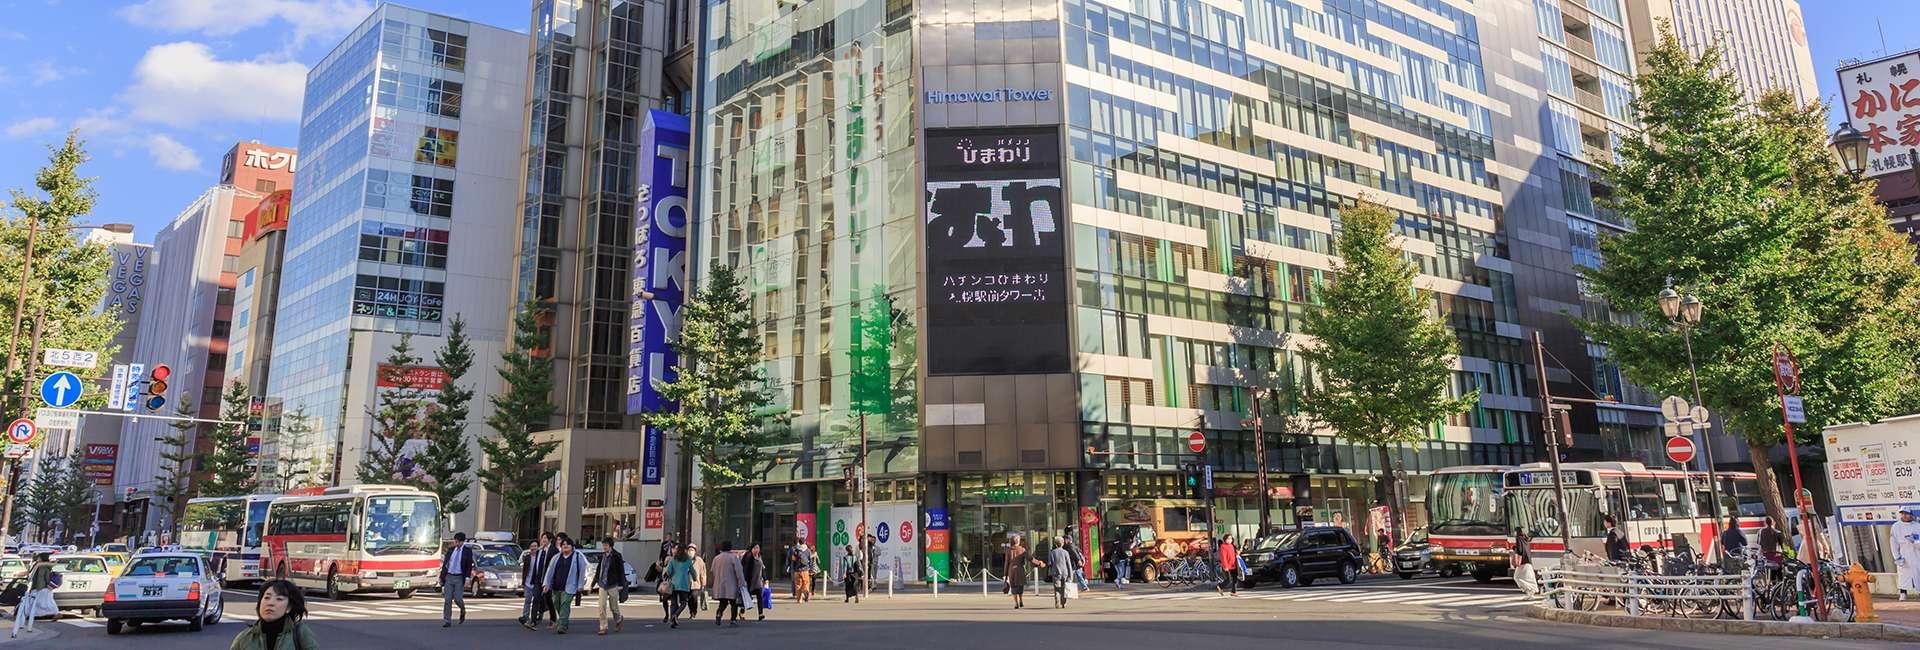 Sapporo in Giappone